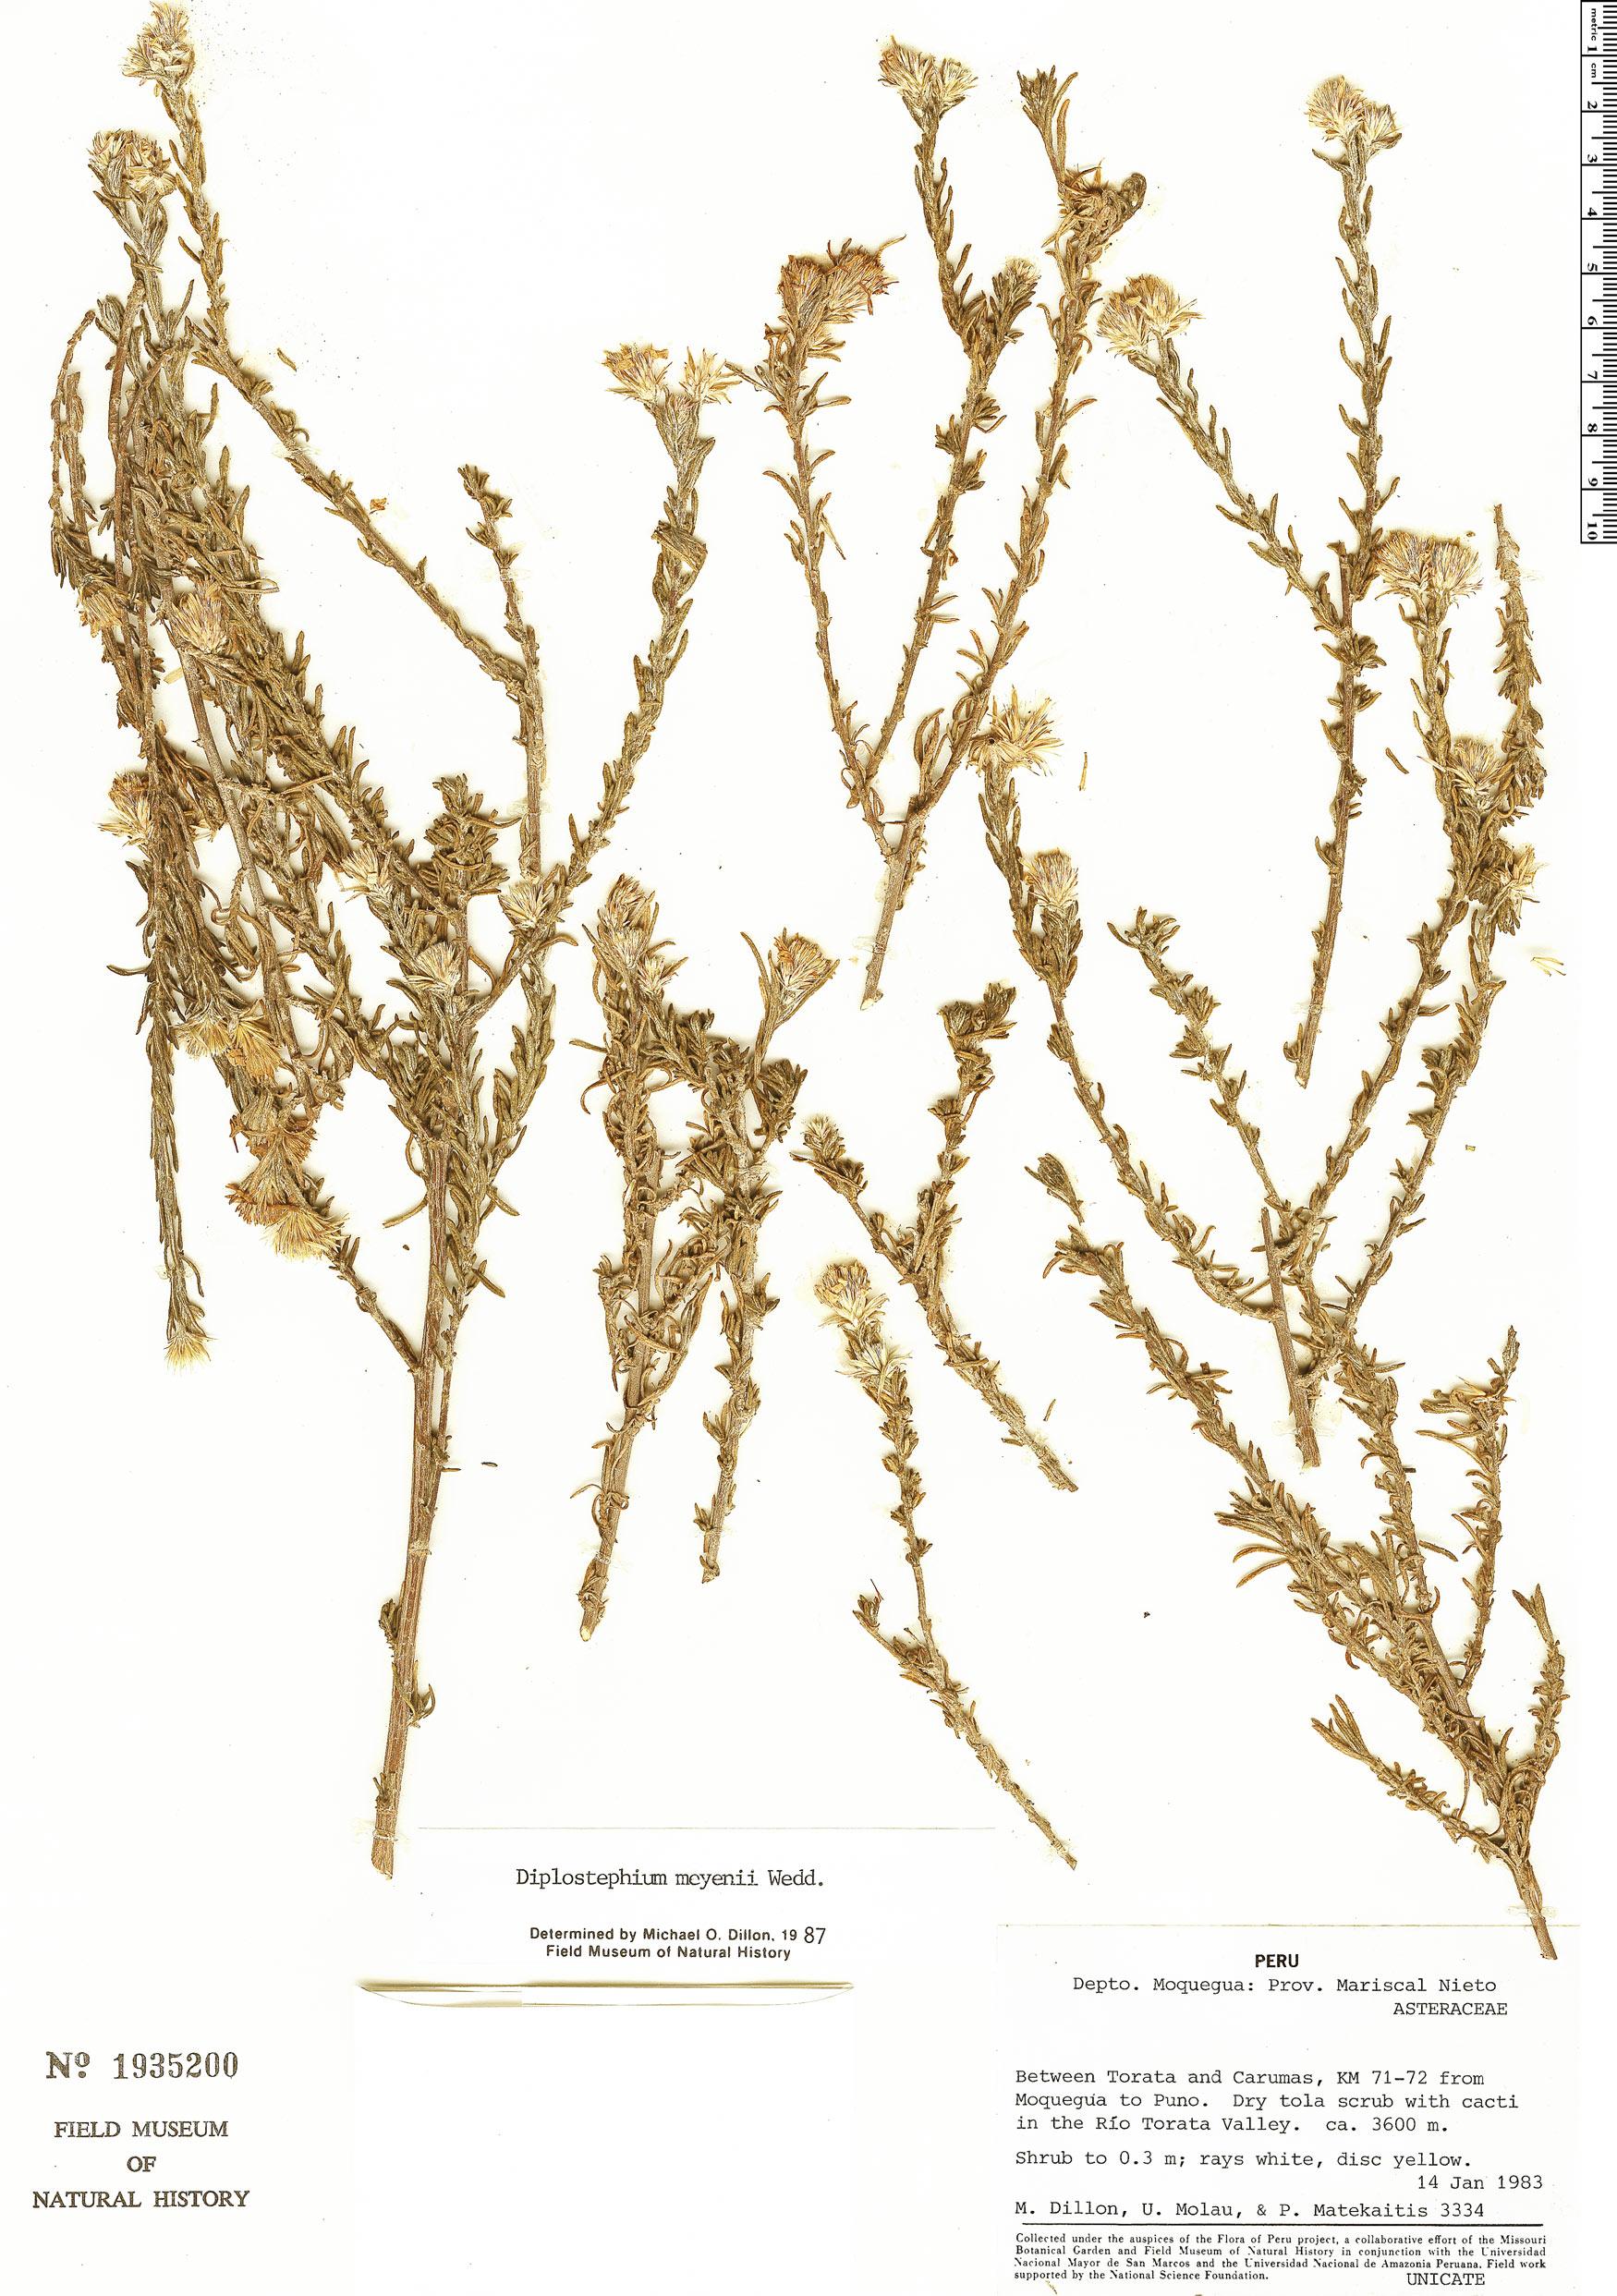 Specimen: Diplostephium meyenii